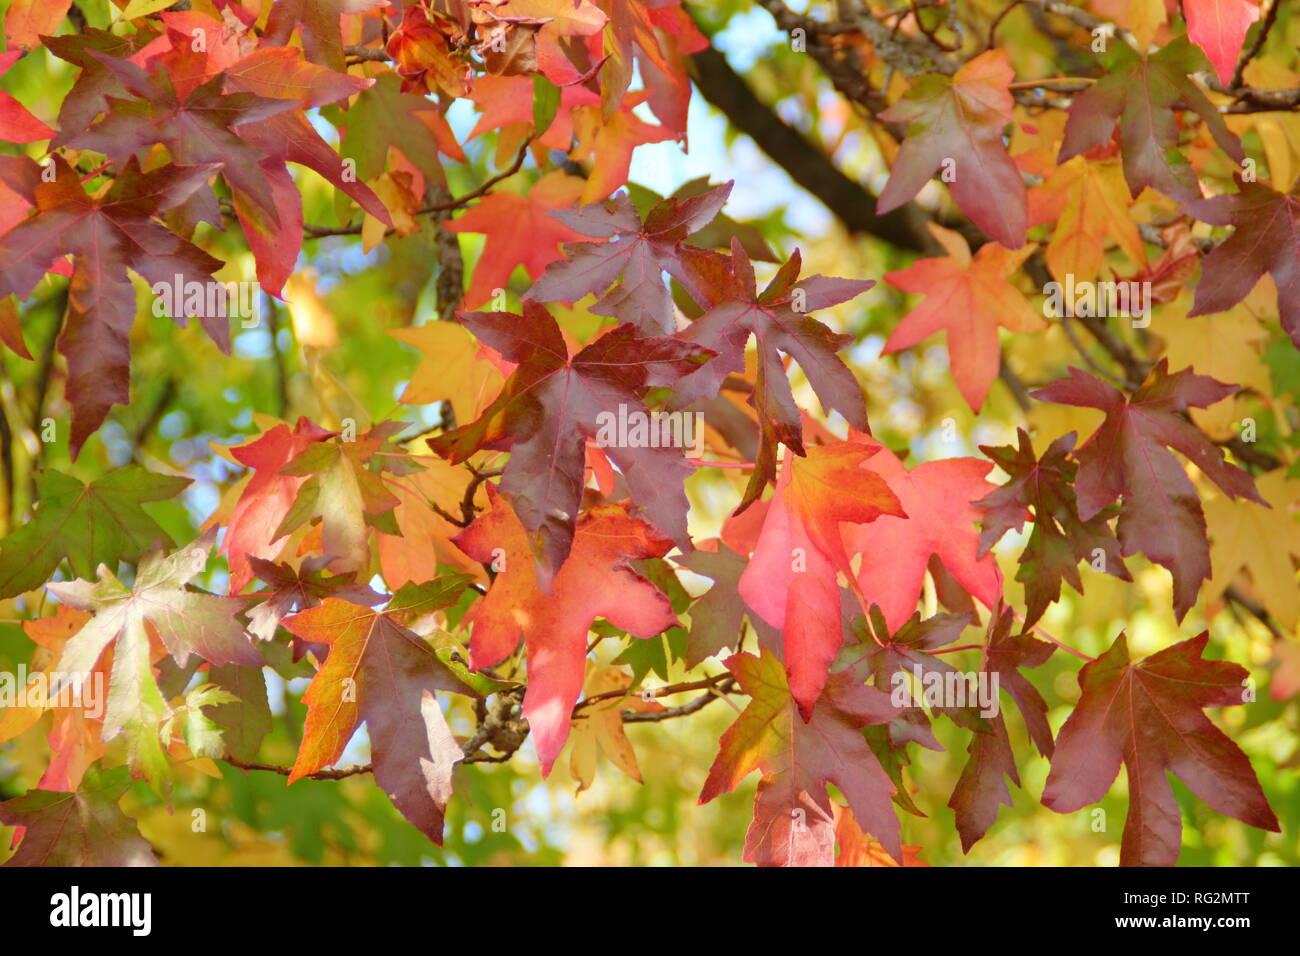 Liquidambar Styraciflua Vibrant Autumn Colours Of Sweet Gum Tree Leaves October Uk Stock Photo Alamy